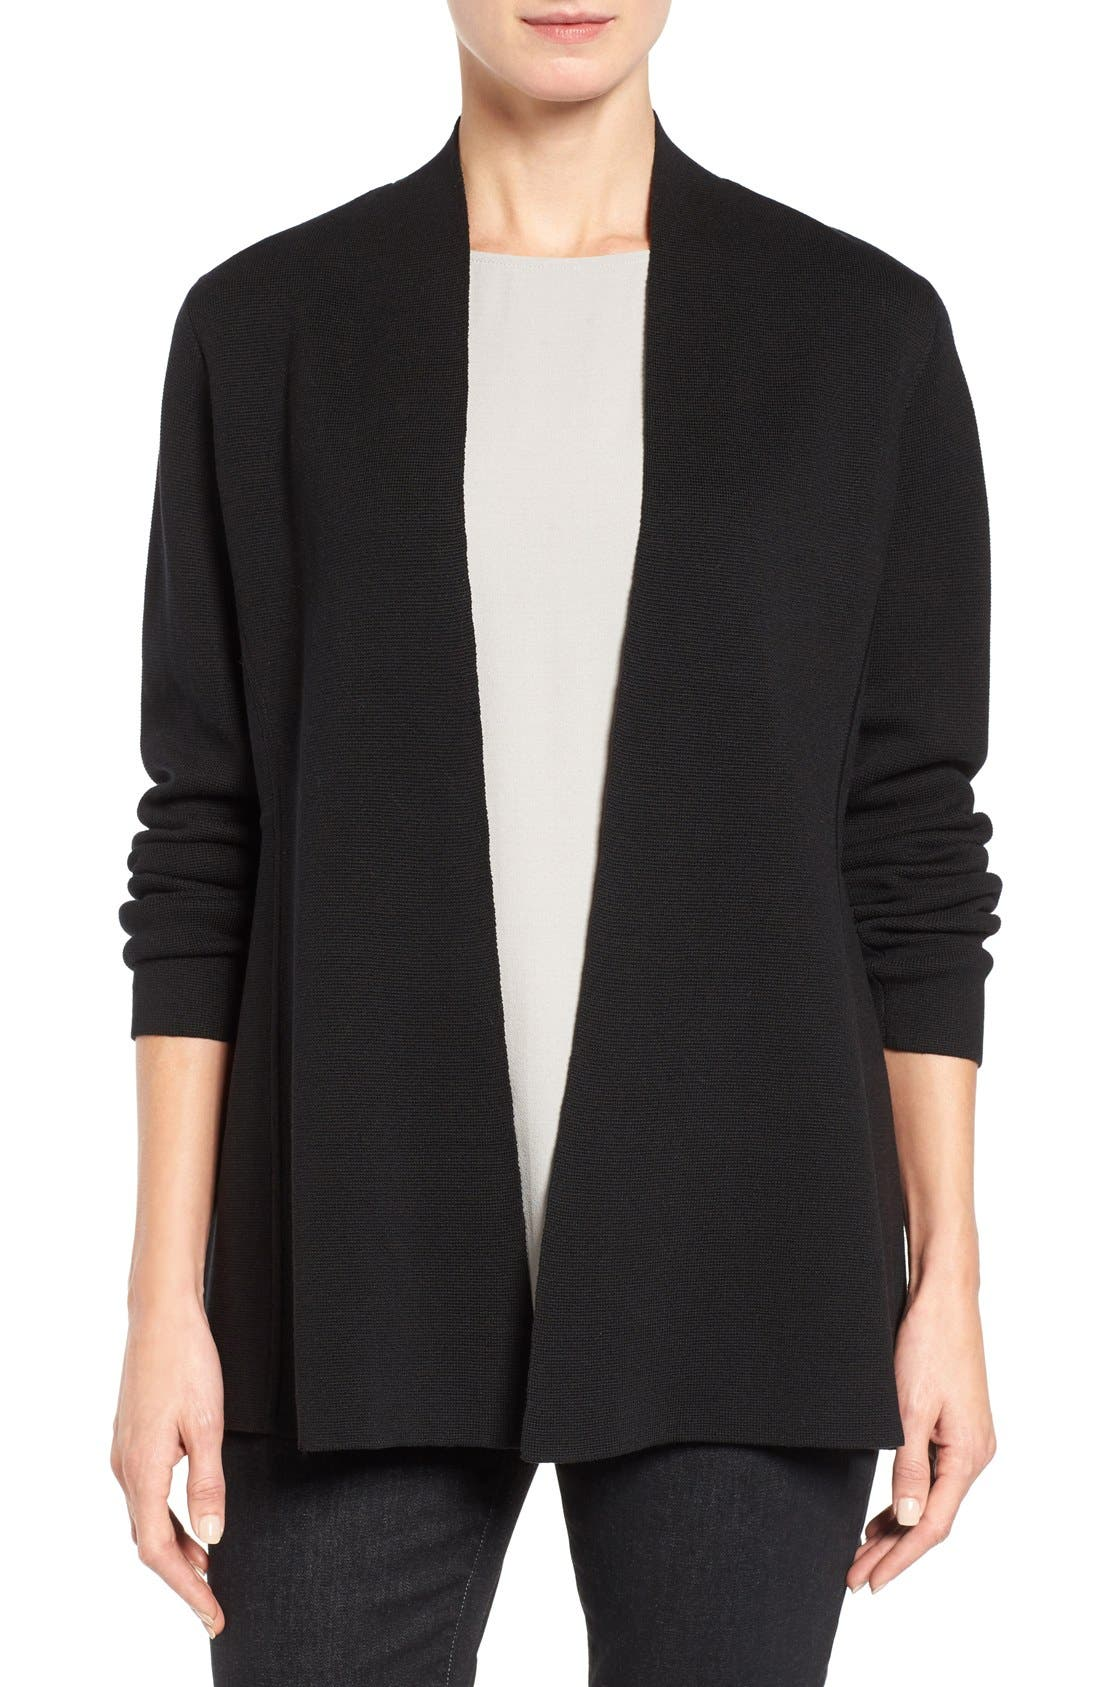 Main Image - Eileen Fisher Silk & Organic Cotton Cardigan (Nordstrom Exclusive)